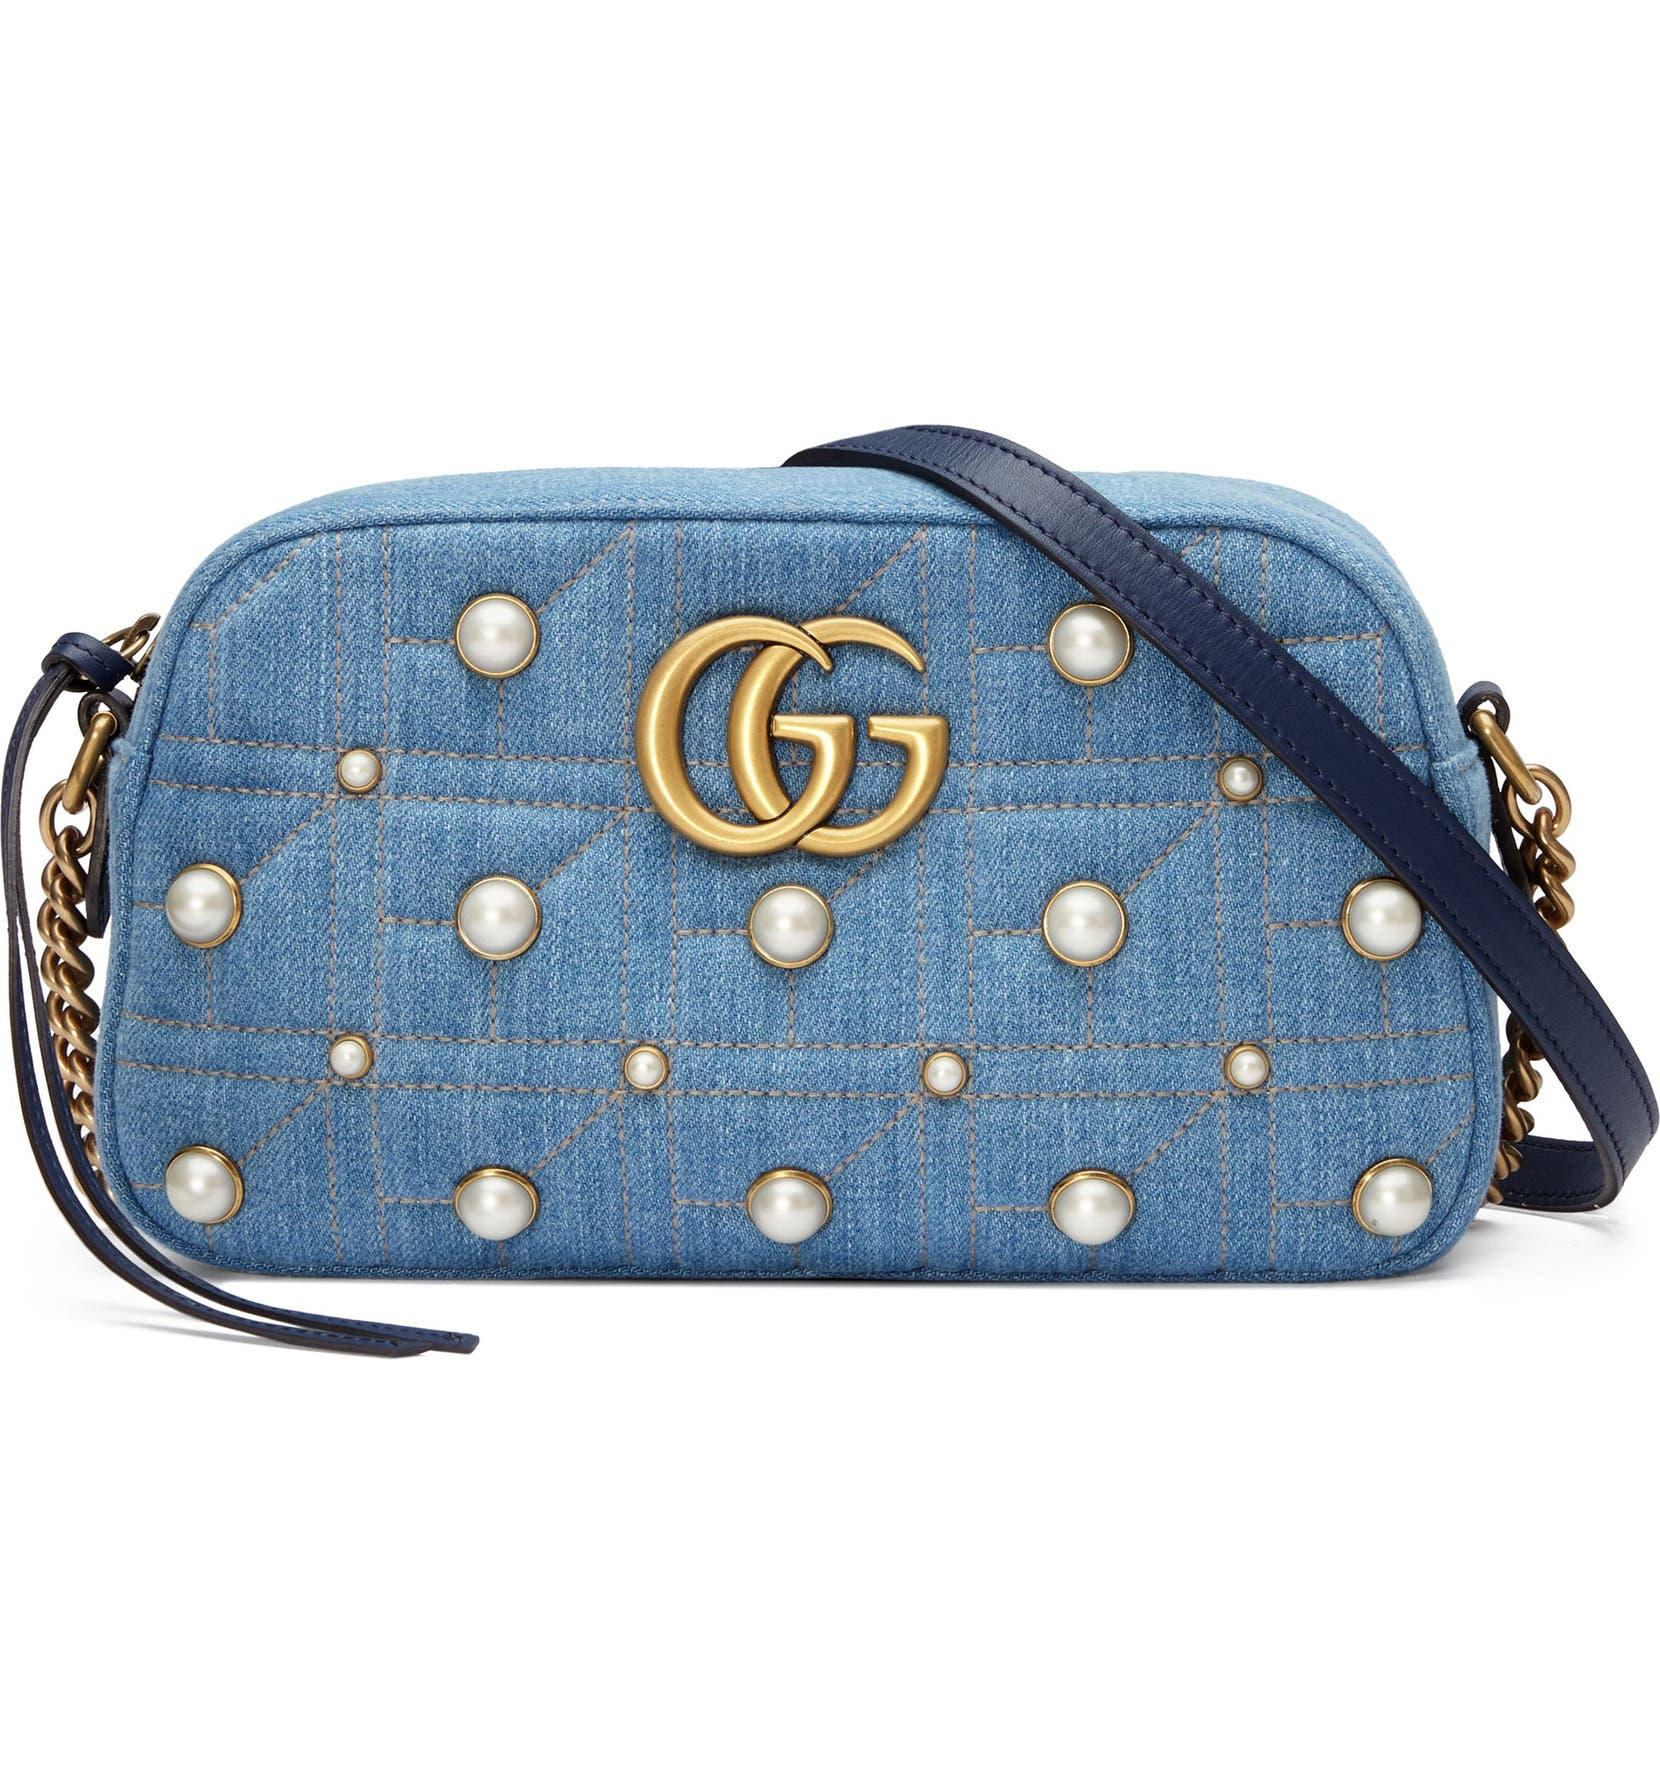 59fab44cddce Gucci Marmont 2.0 Imitation Pearl Embellished Denim Camera Bag   Nordstrom